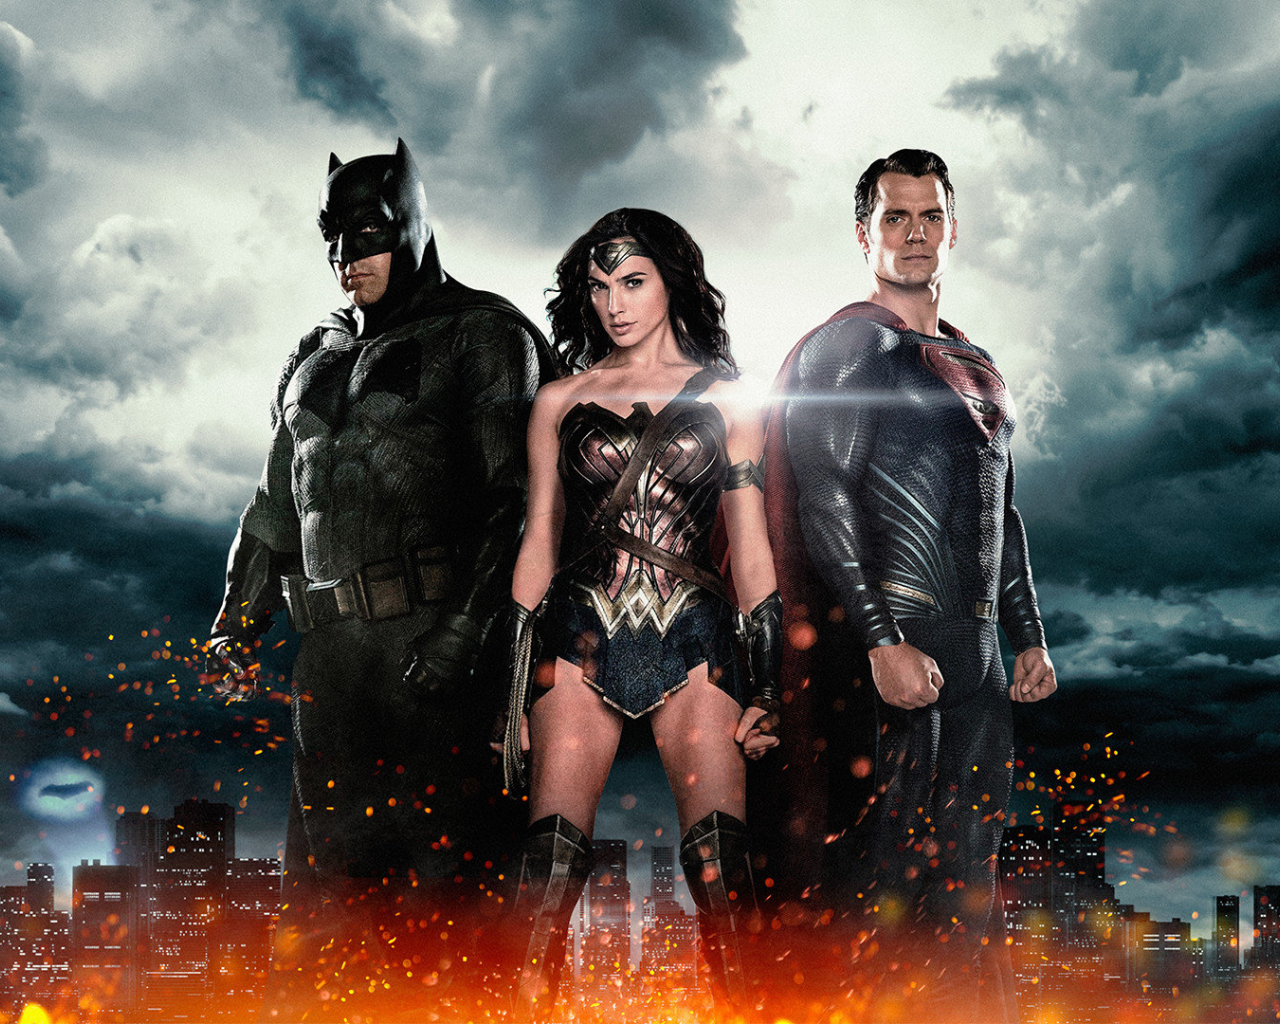 Free Download Download Batman V Superman Dawn Of Justice Wallpaper